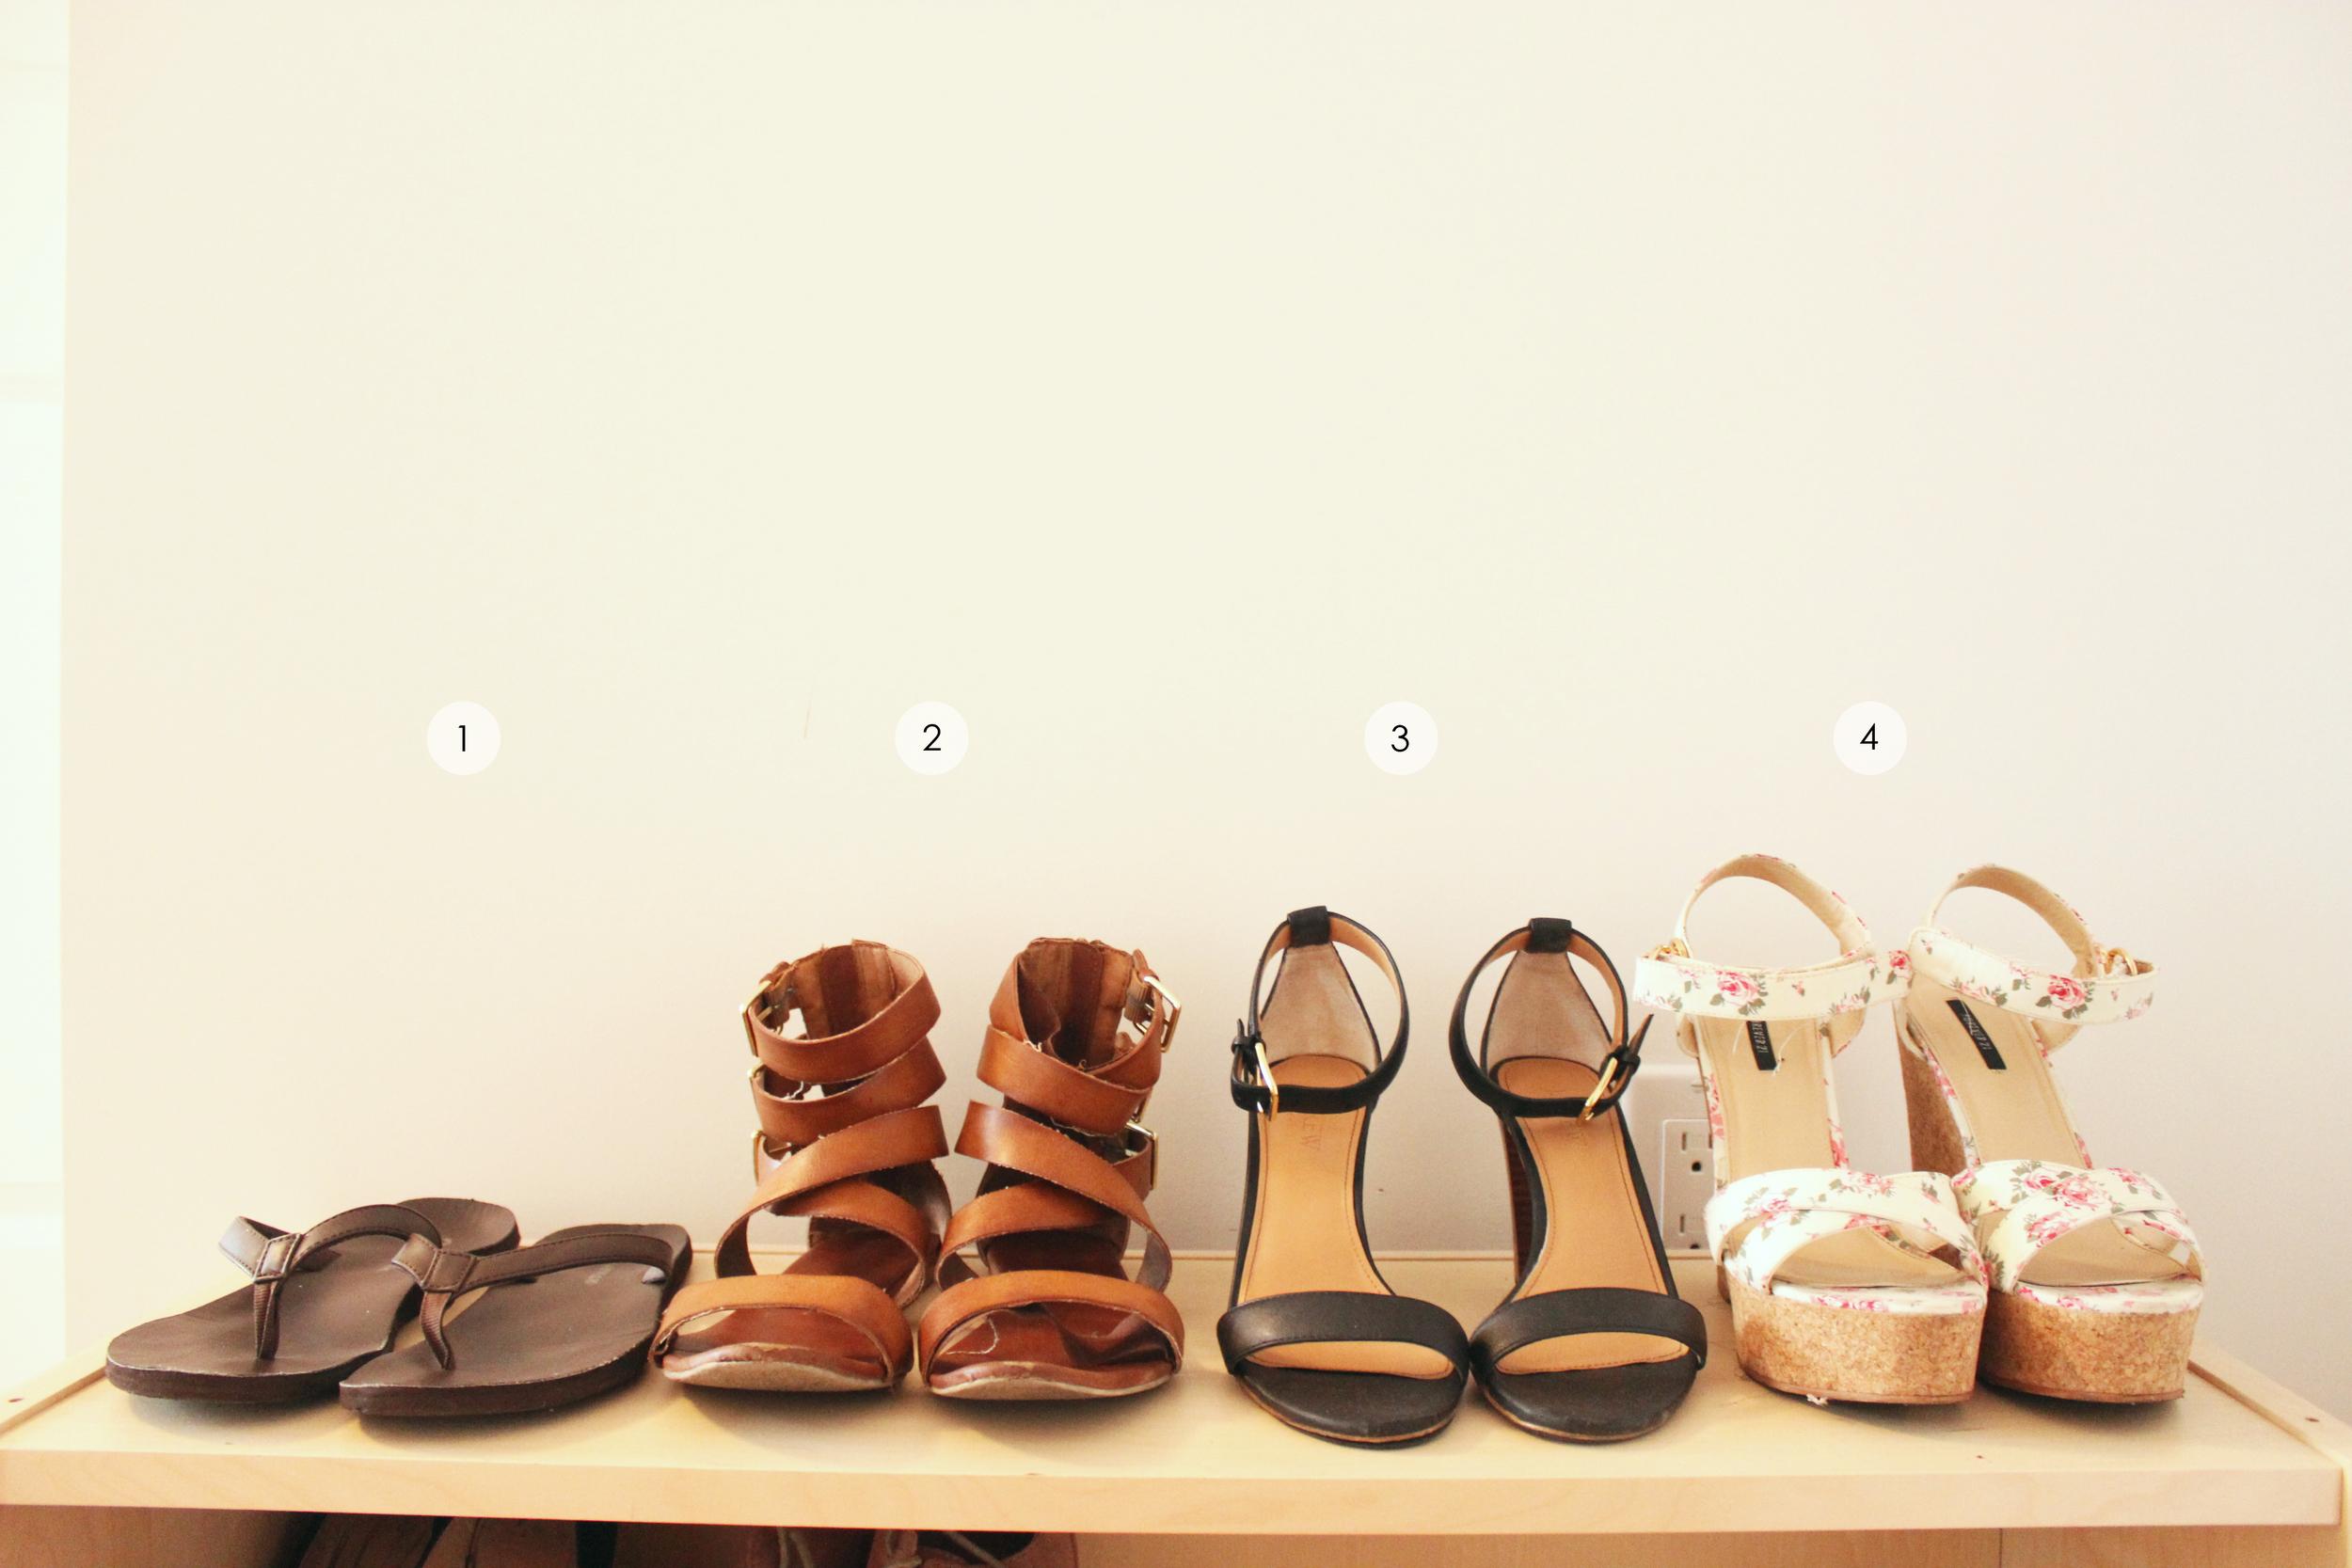 Shoe essentials: 1. Flip flops 2. Everyday sandals 3. Multi-purpose black heels 4. Summer wedges